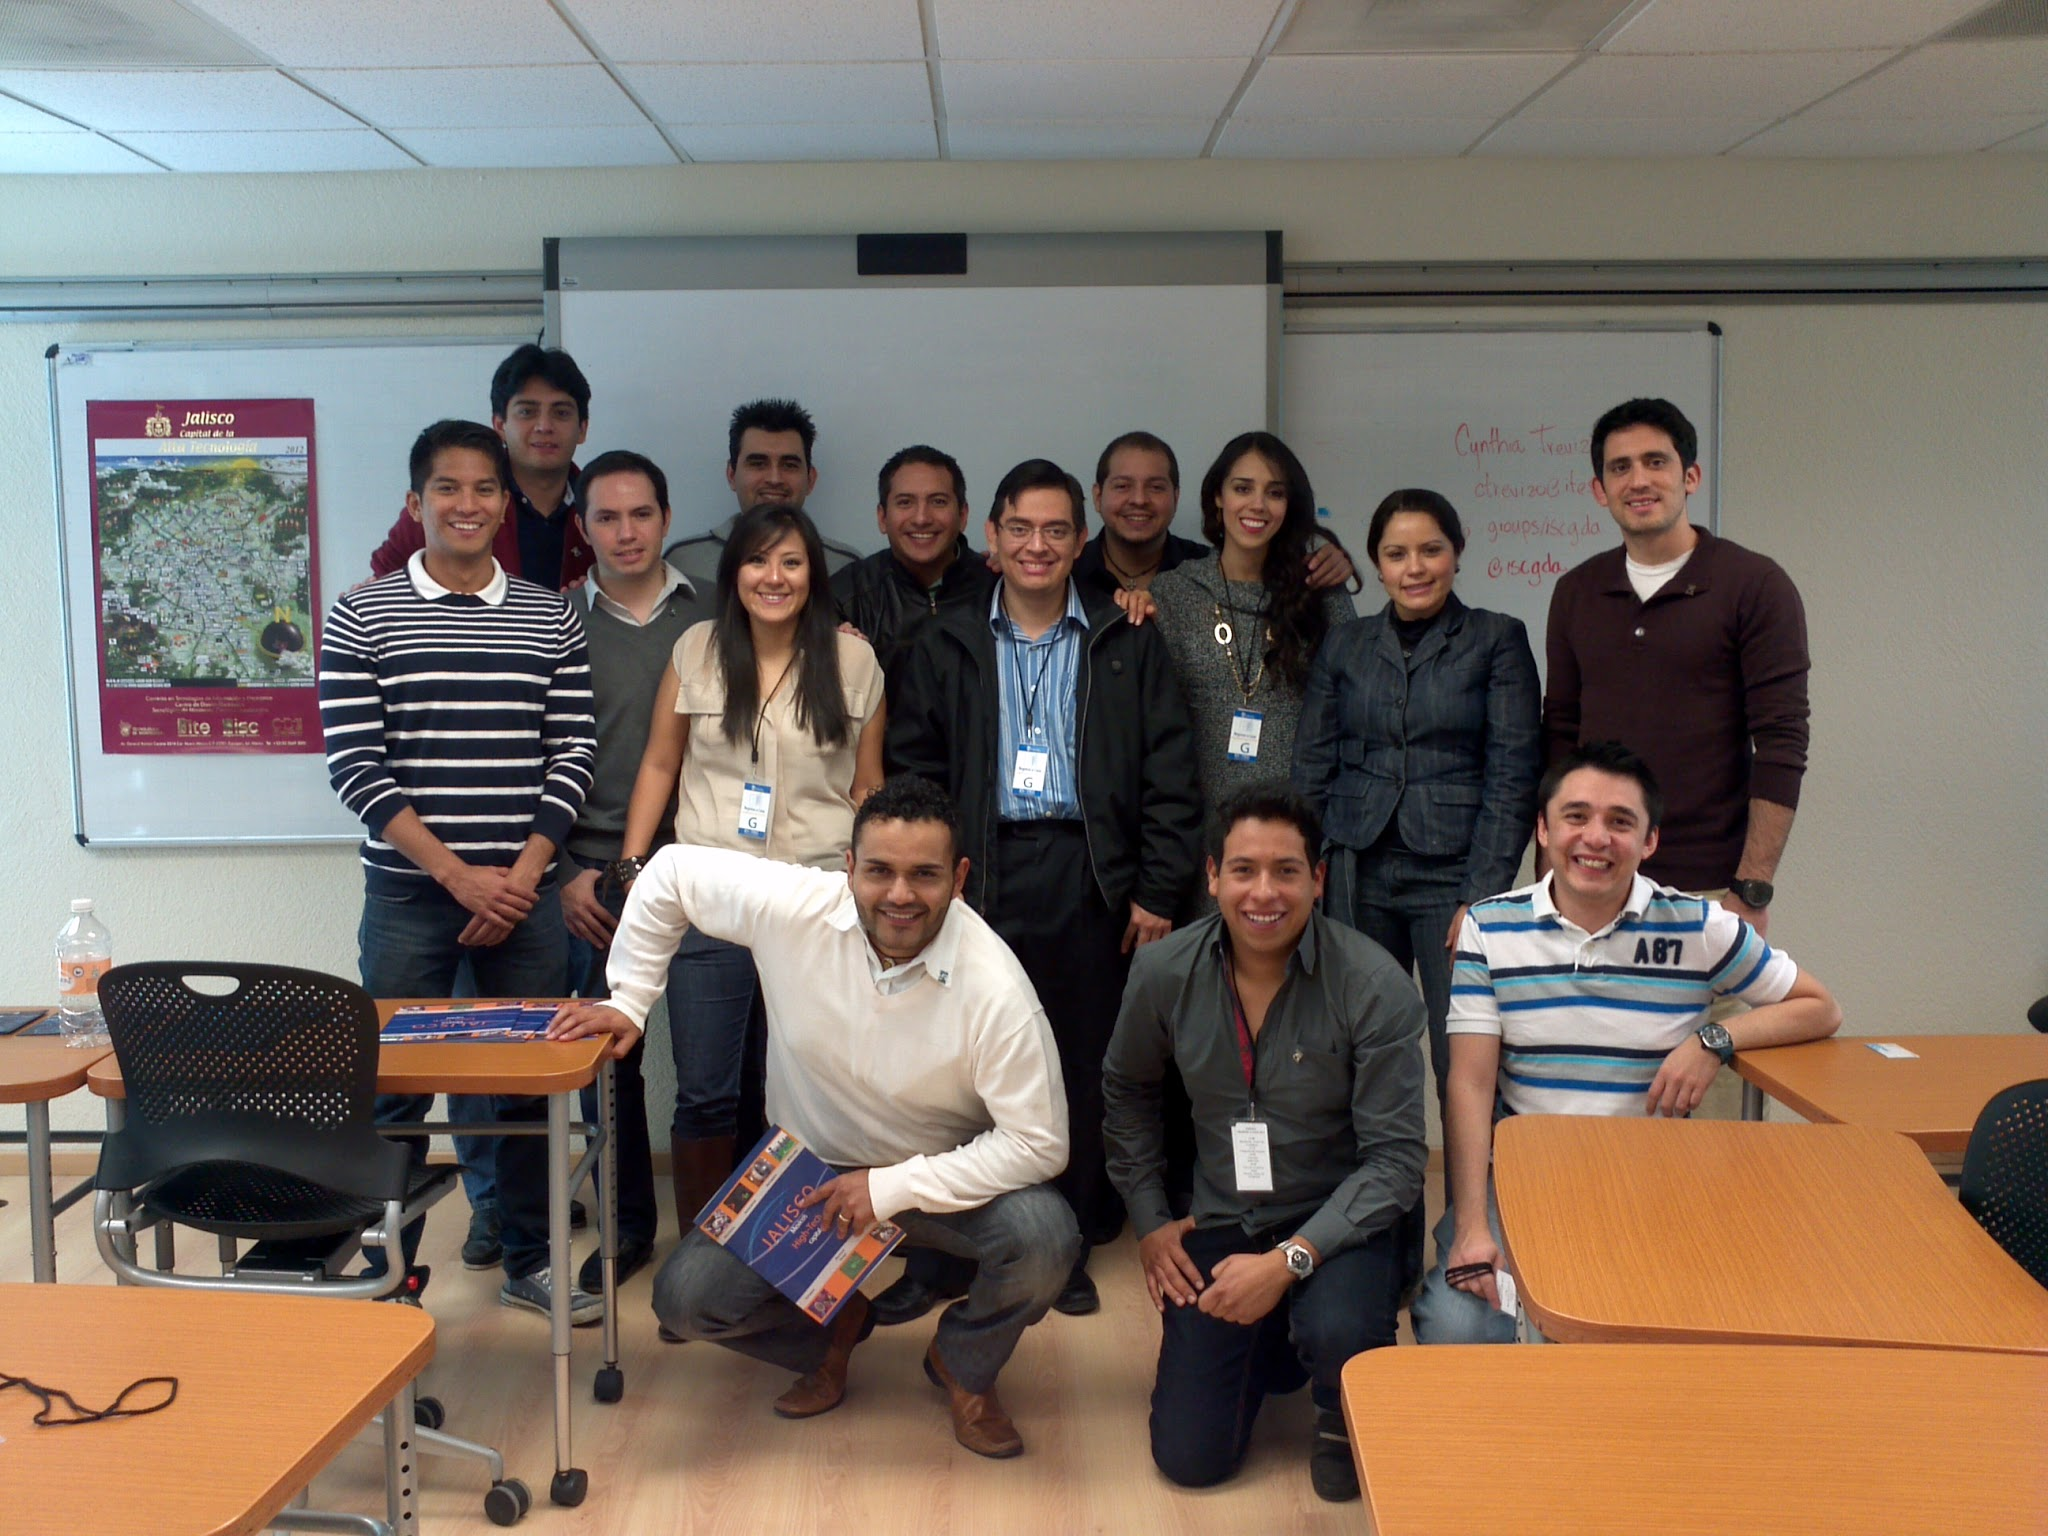 Alumni Class of 2007 ISC Campus Guadalajara